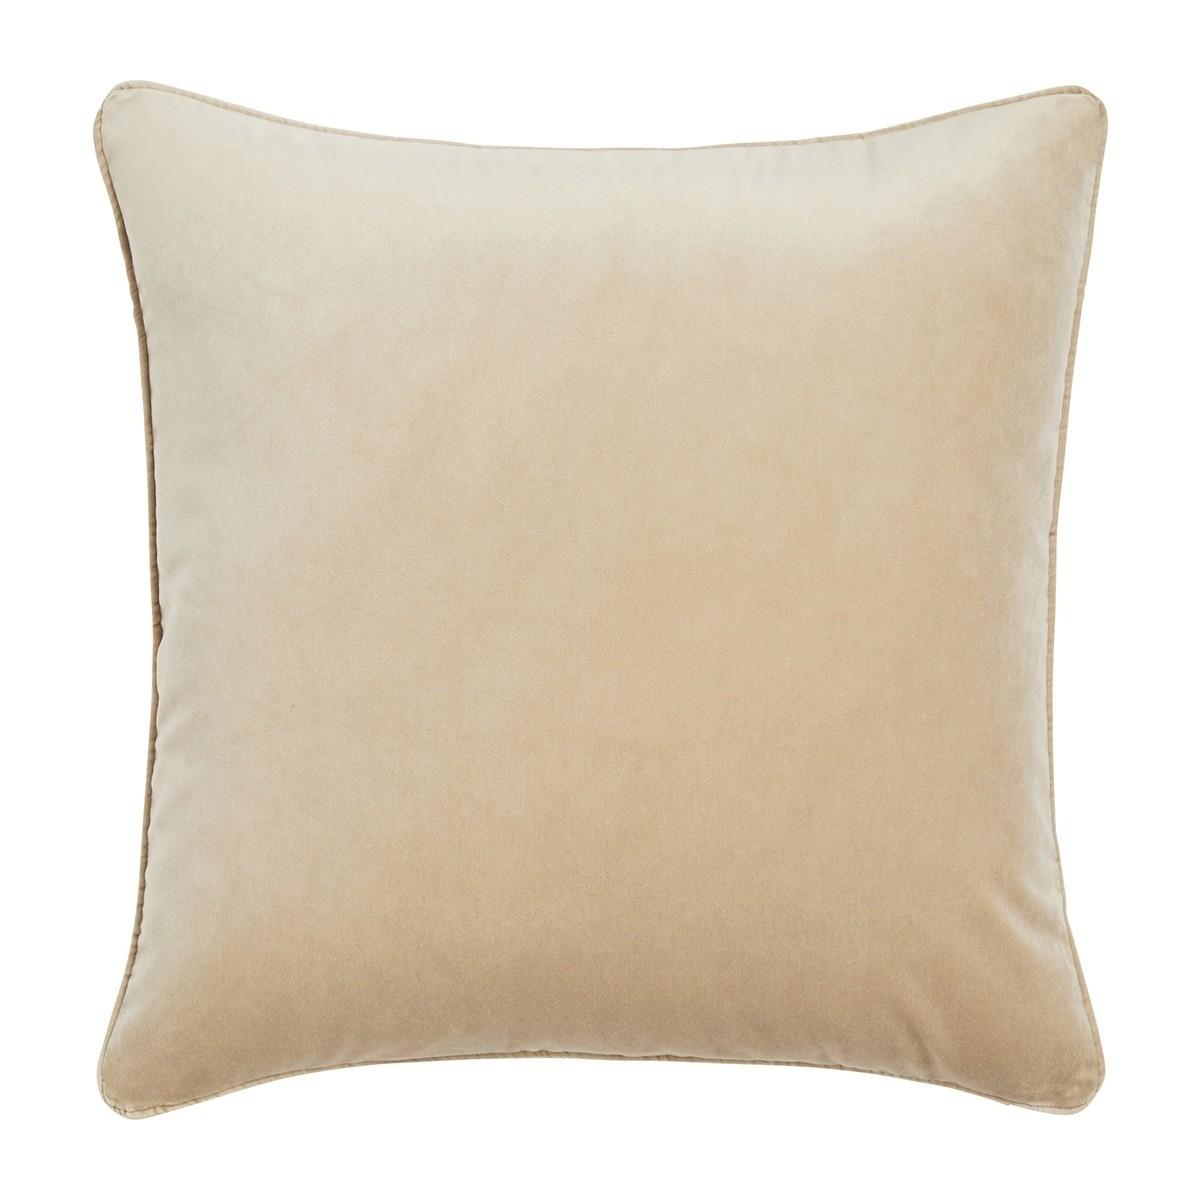 Mallard Side Chairs With Cushion Regarding 2017 Weave – Zoe Cushion – Modern Cushions Buy Your Homewares Online Or (View 9 of 20)